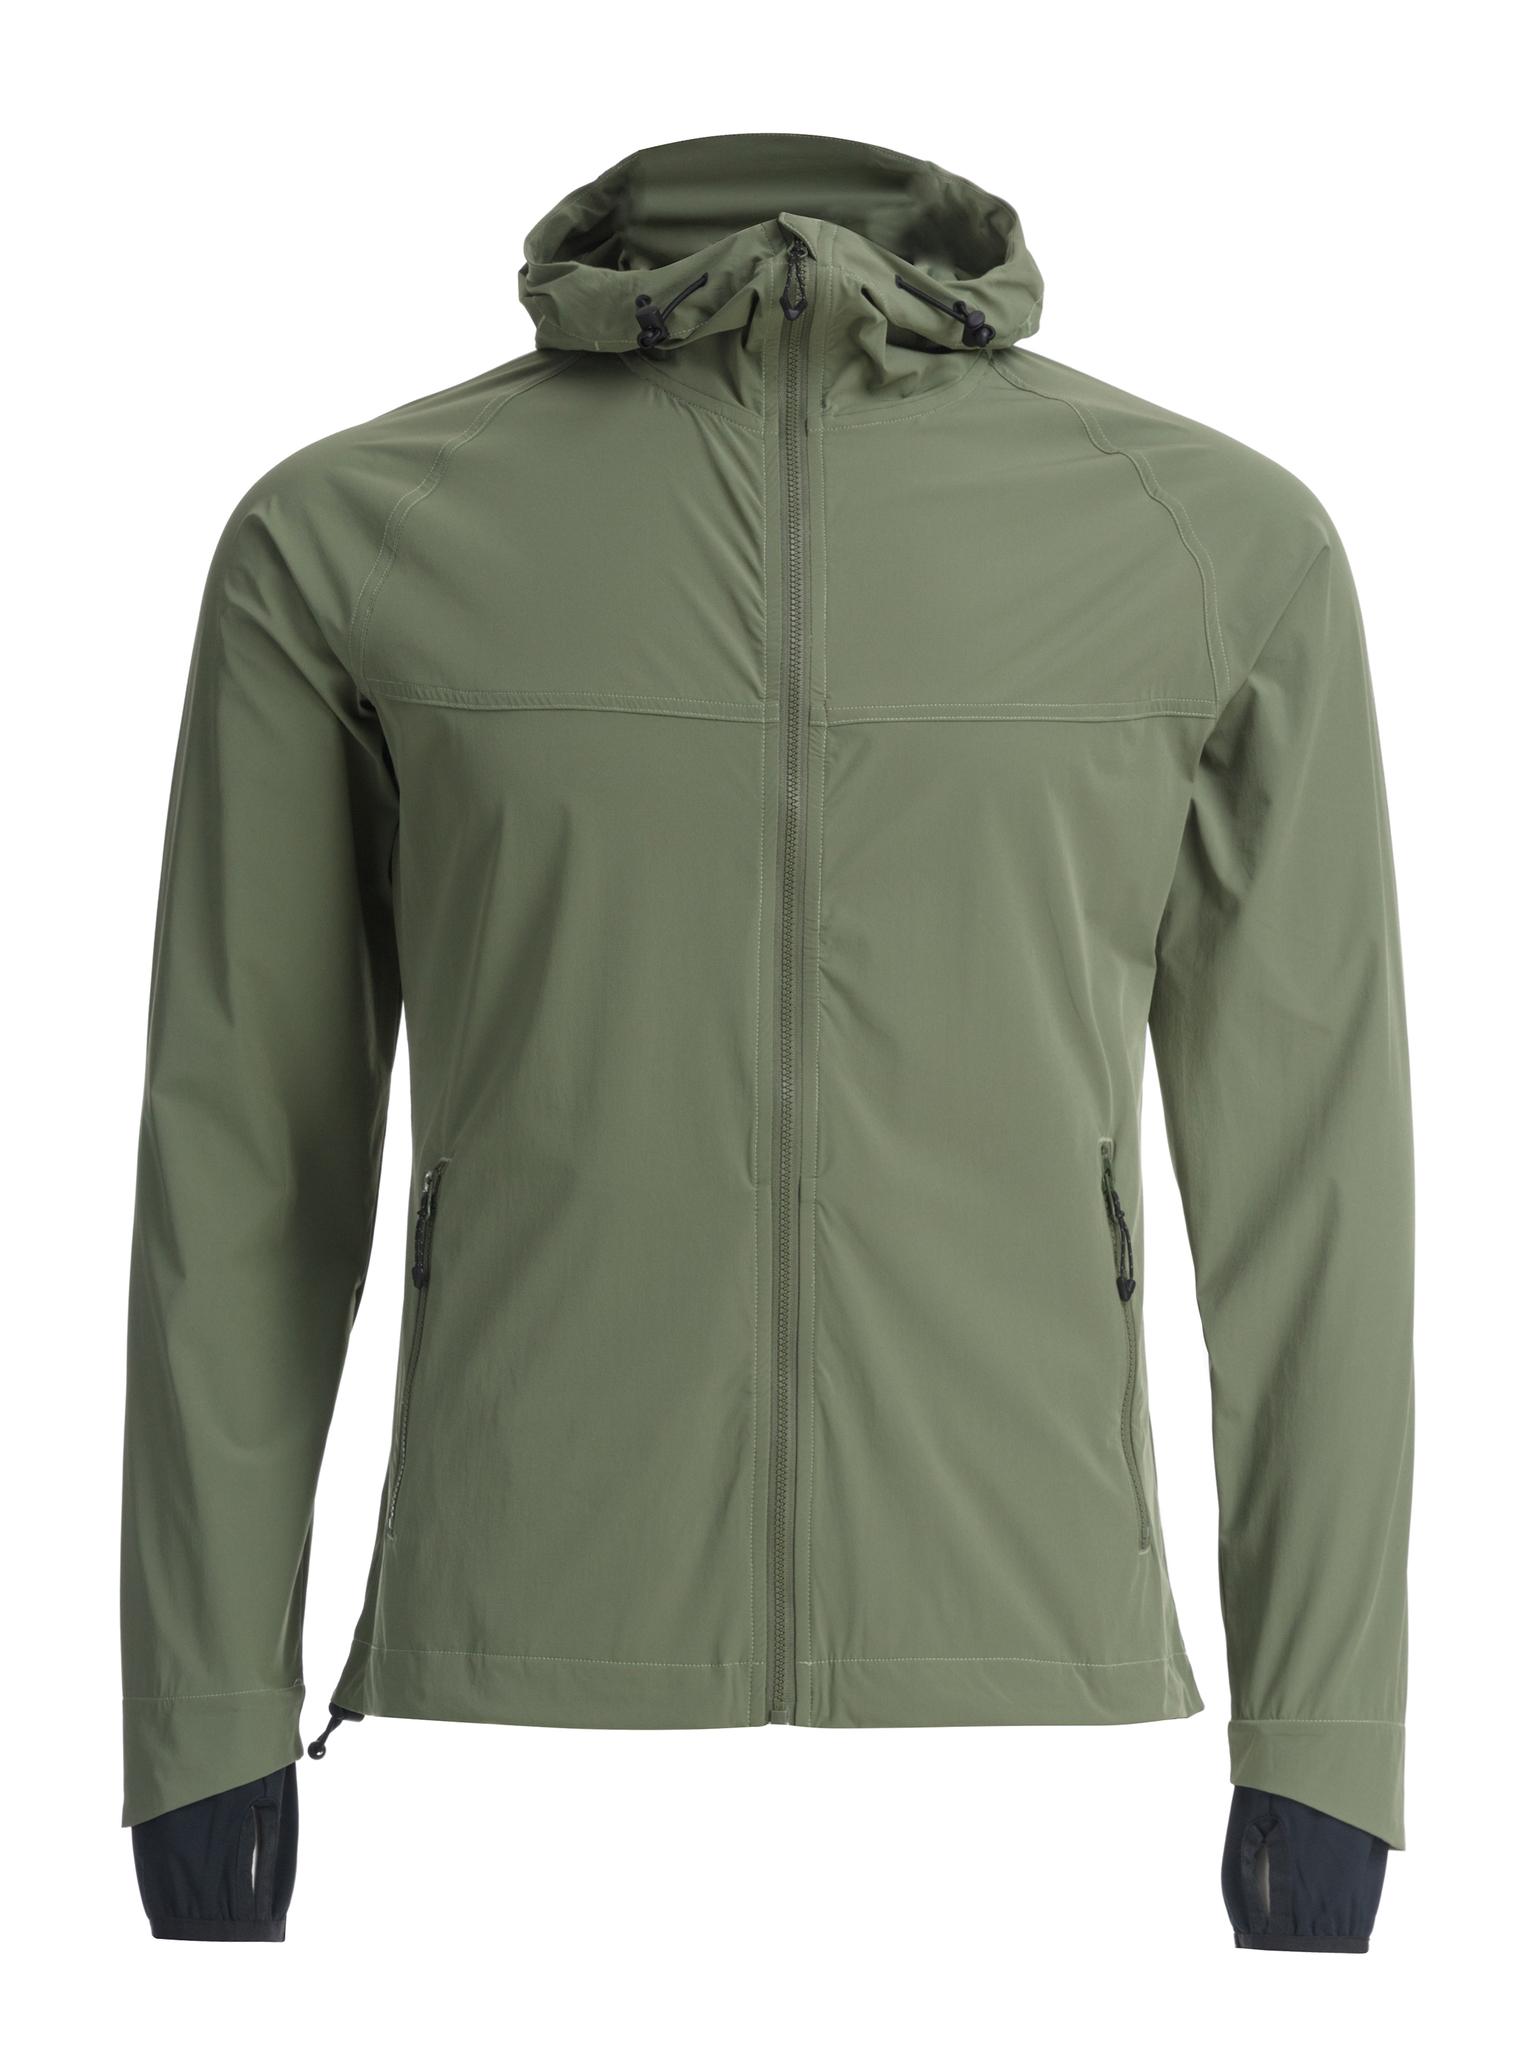 Куртка мужская GRI Джеди 2.0, оливковая